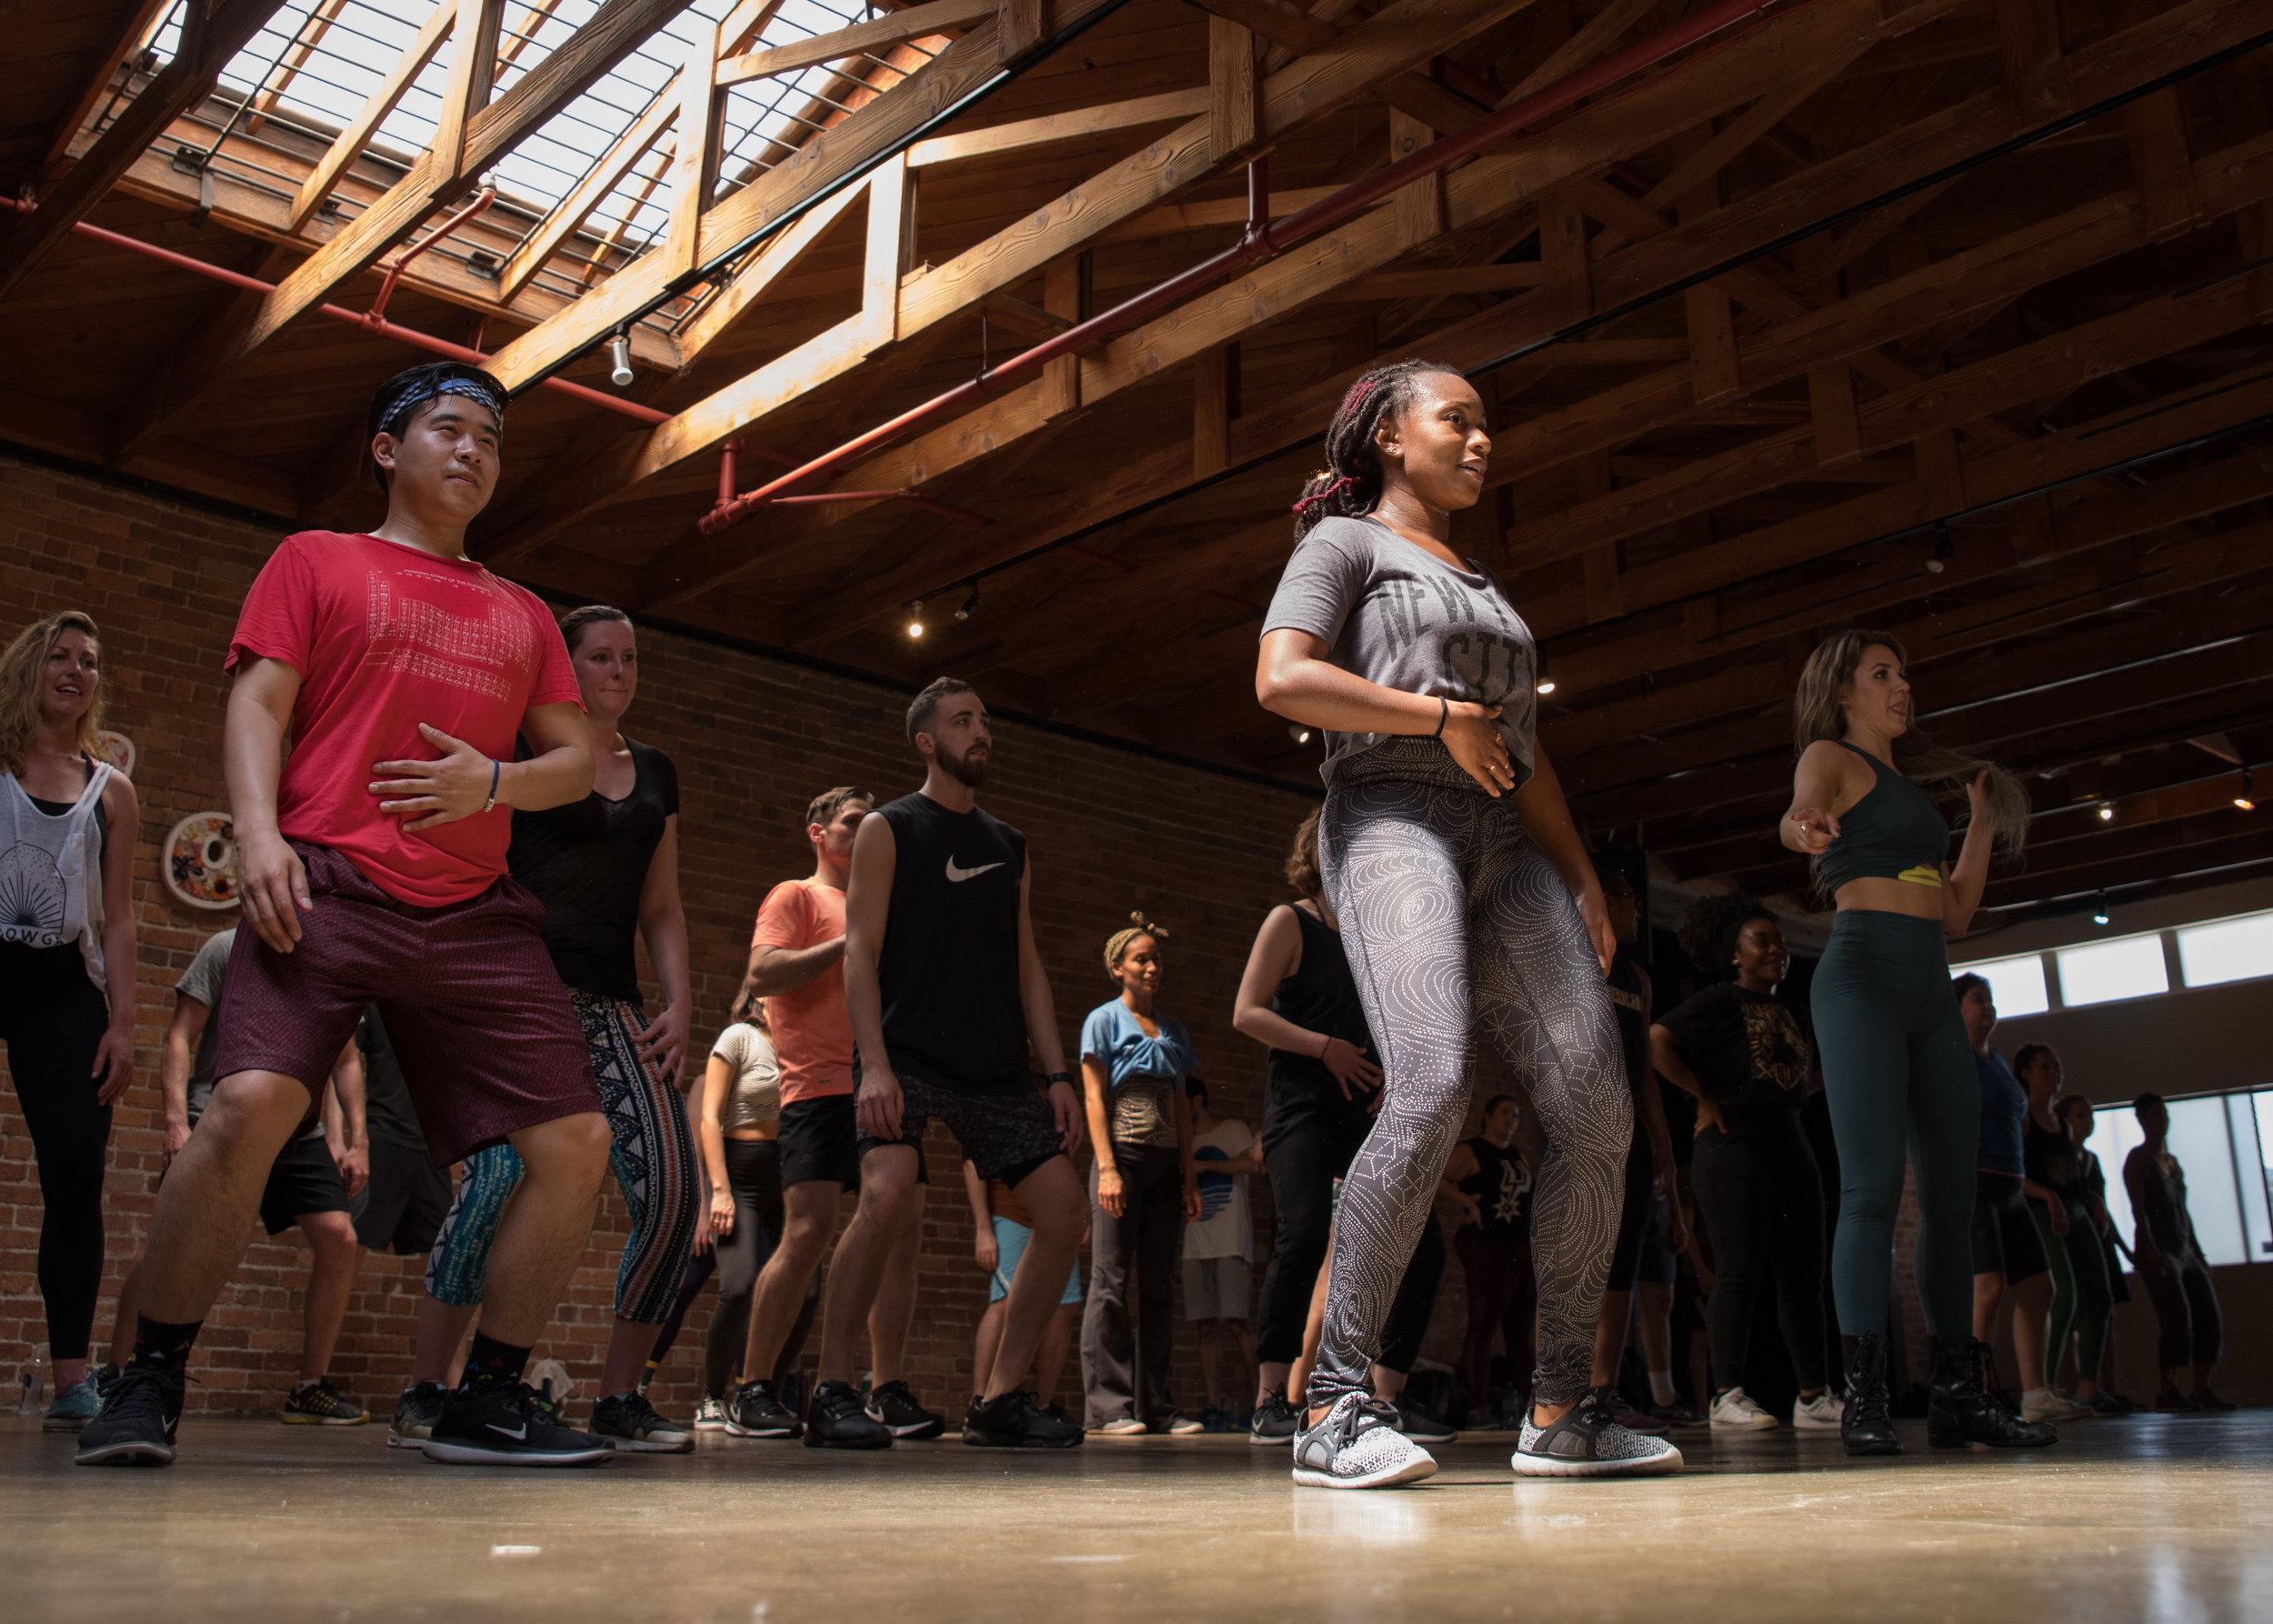 We Dance for Africa_4.21.2018_Corrected-16.jpg